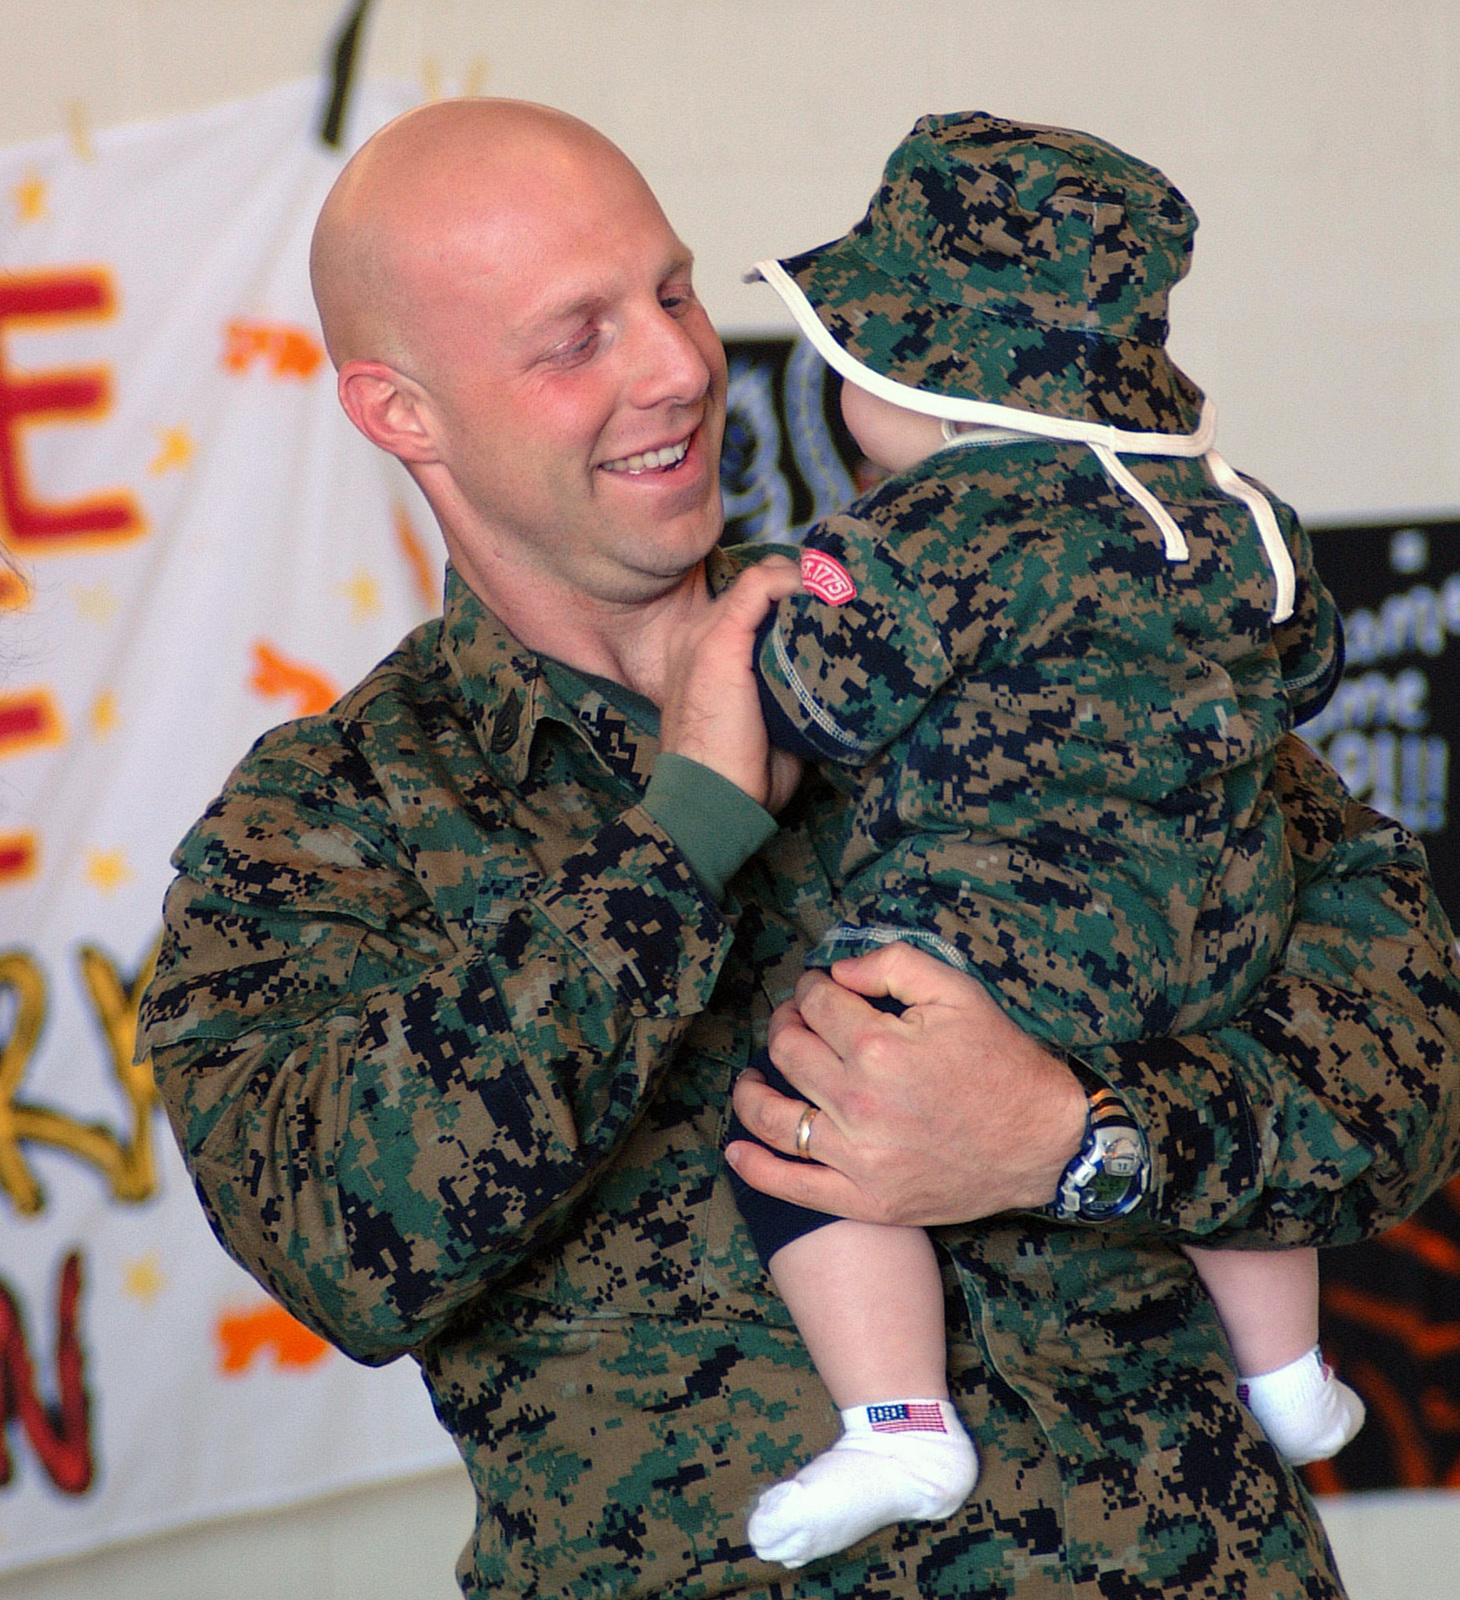 us marine corps usmc gunnery sergeant gysgt frank pater